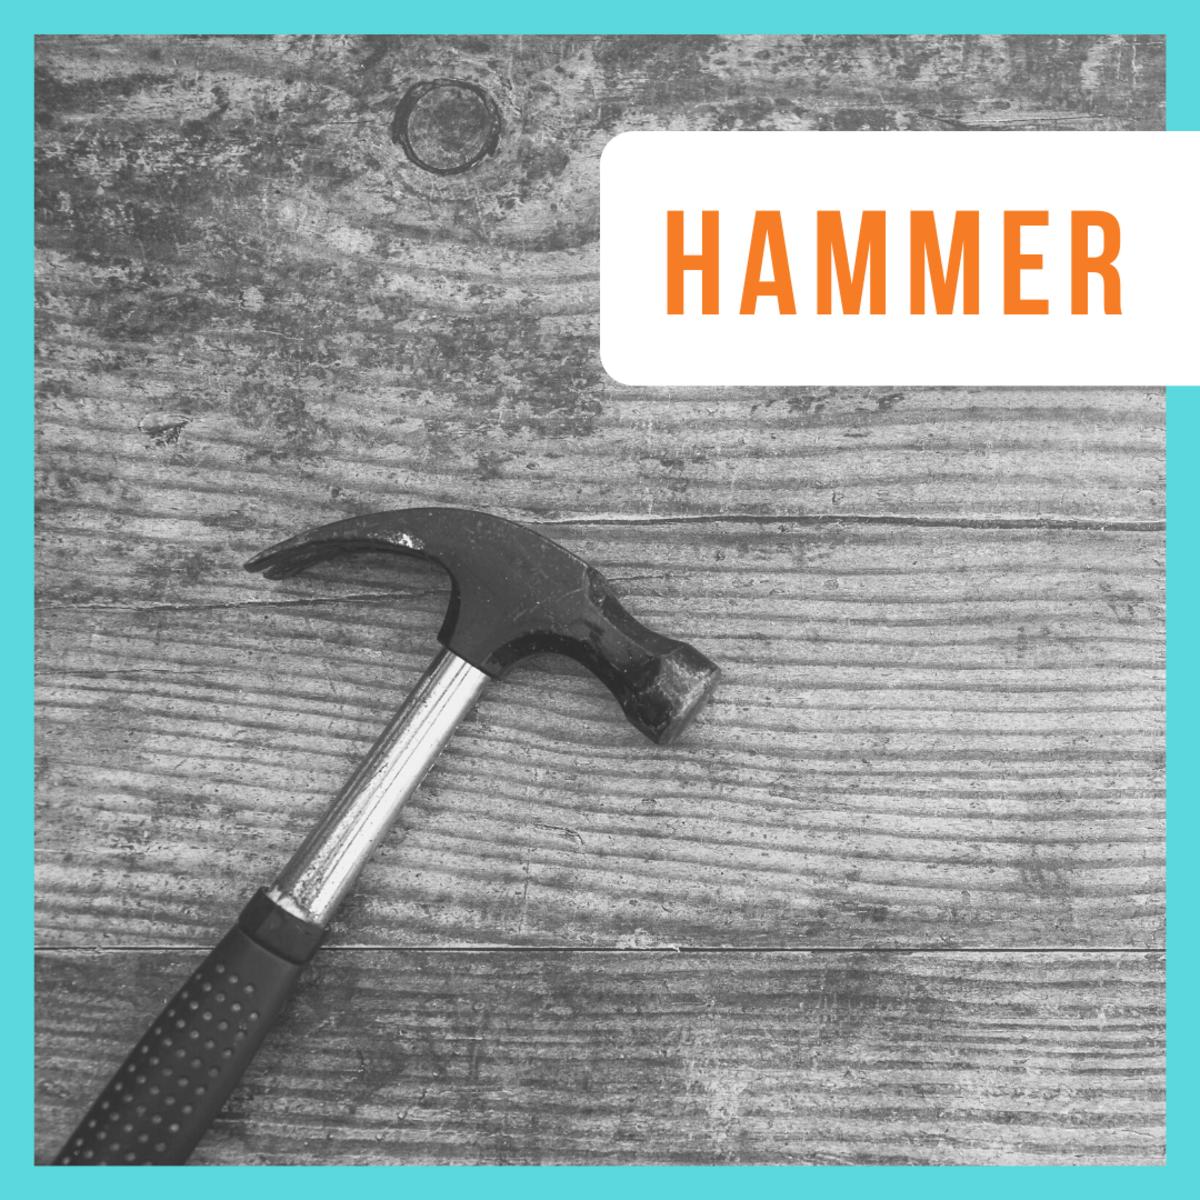 You choose...hammer or screw?